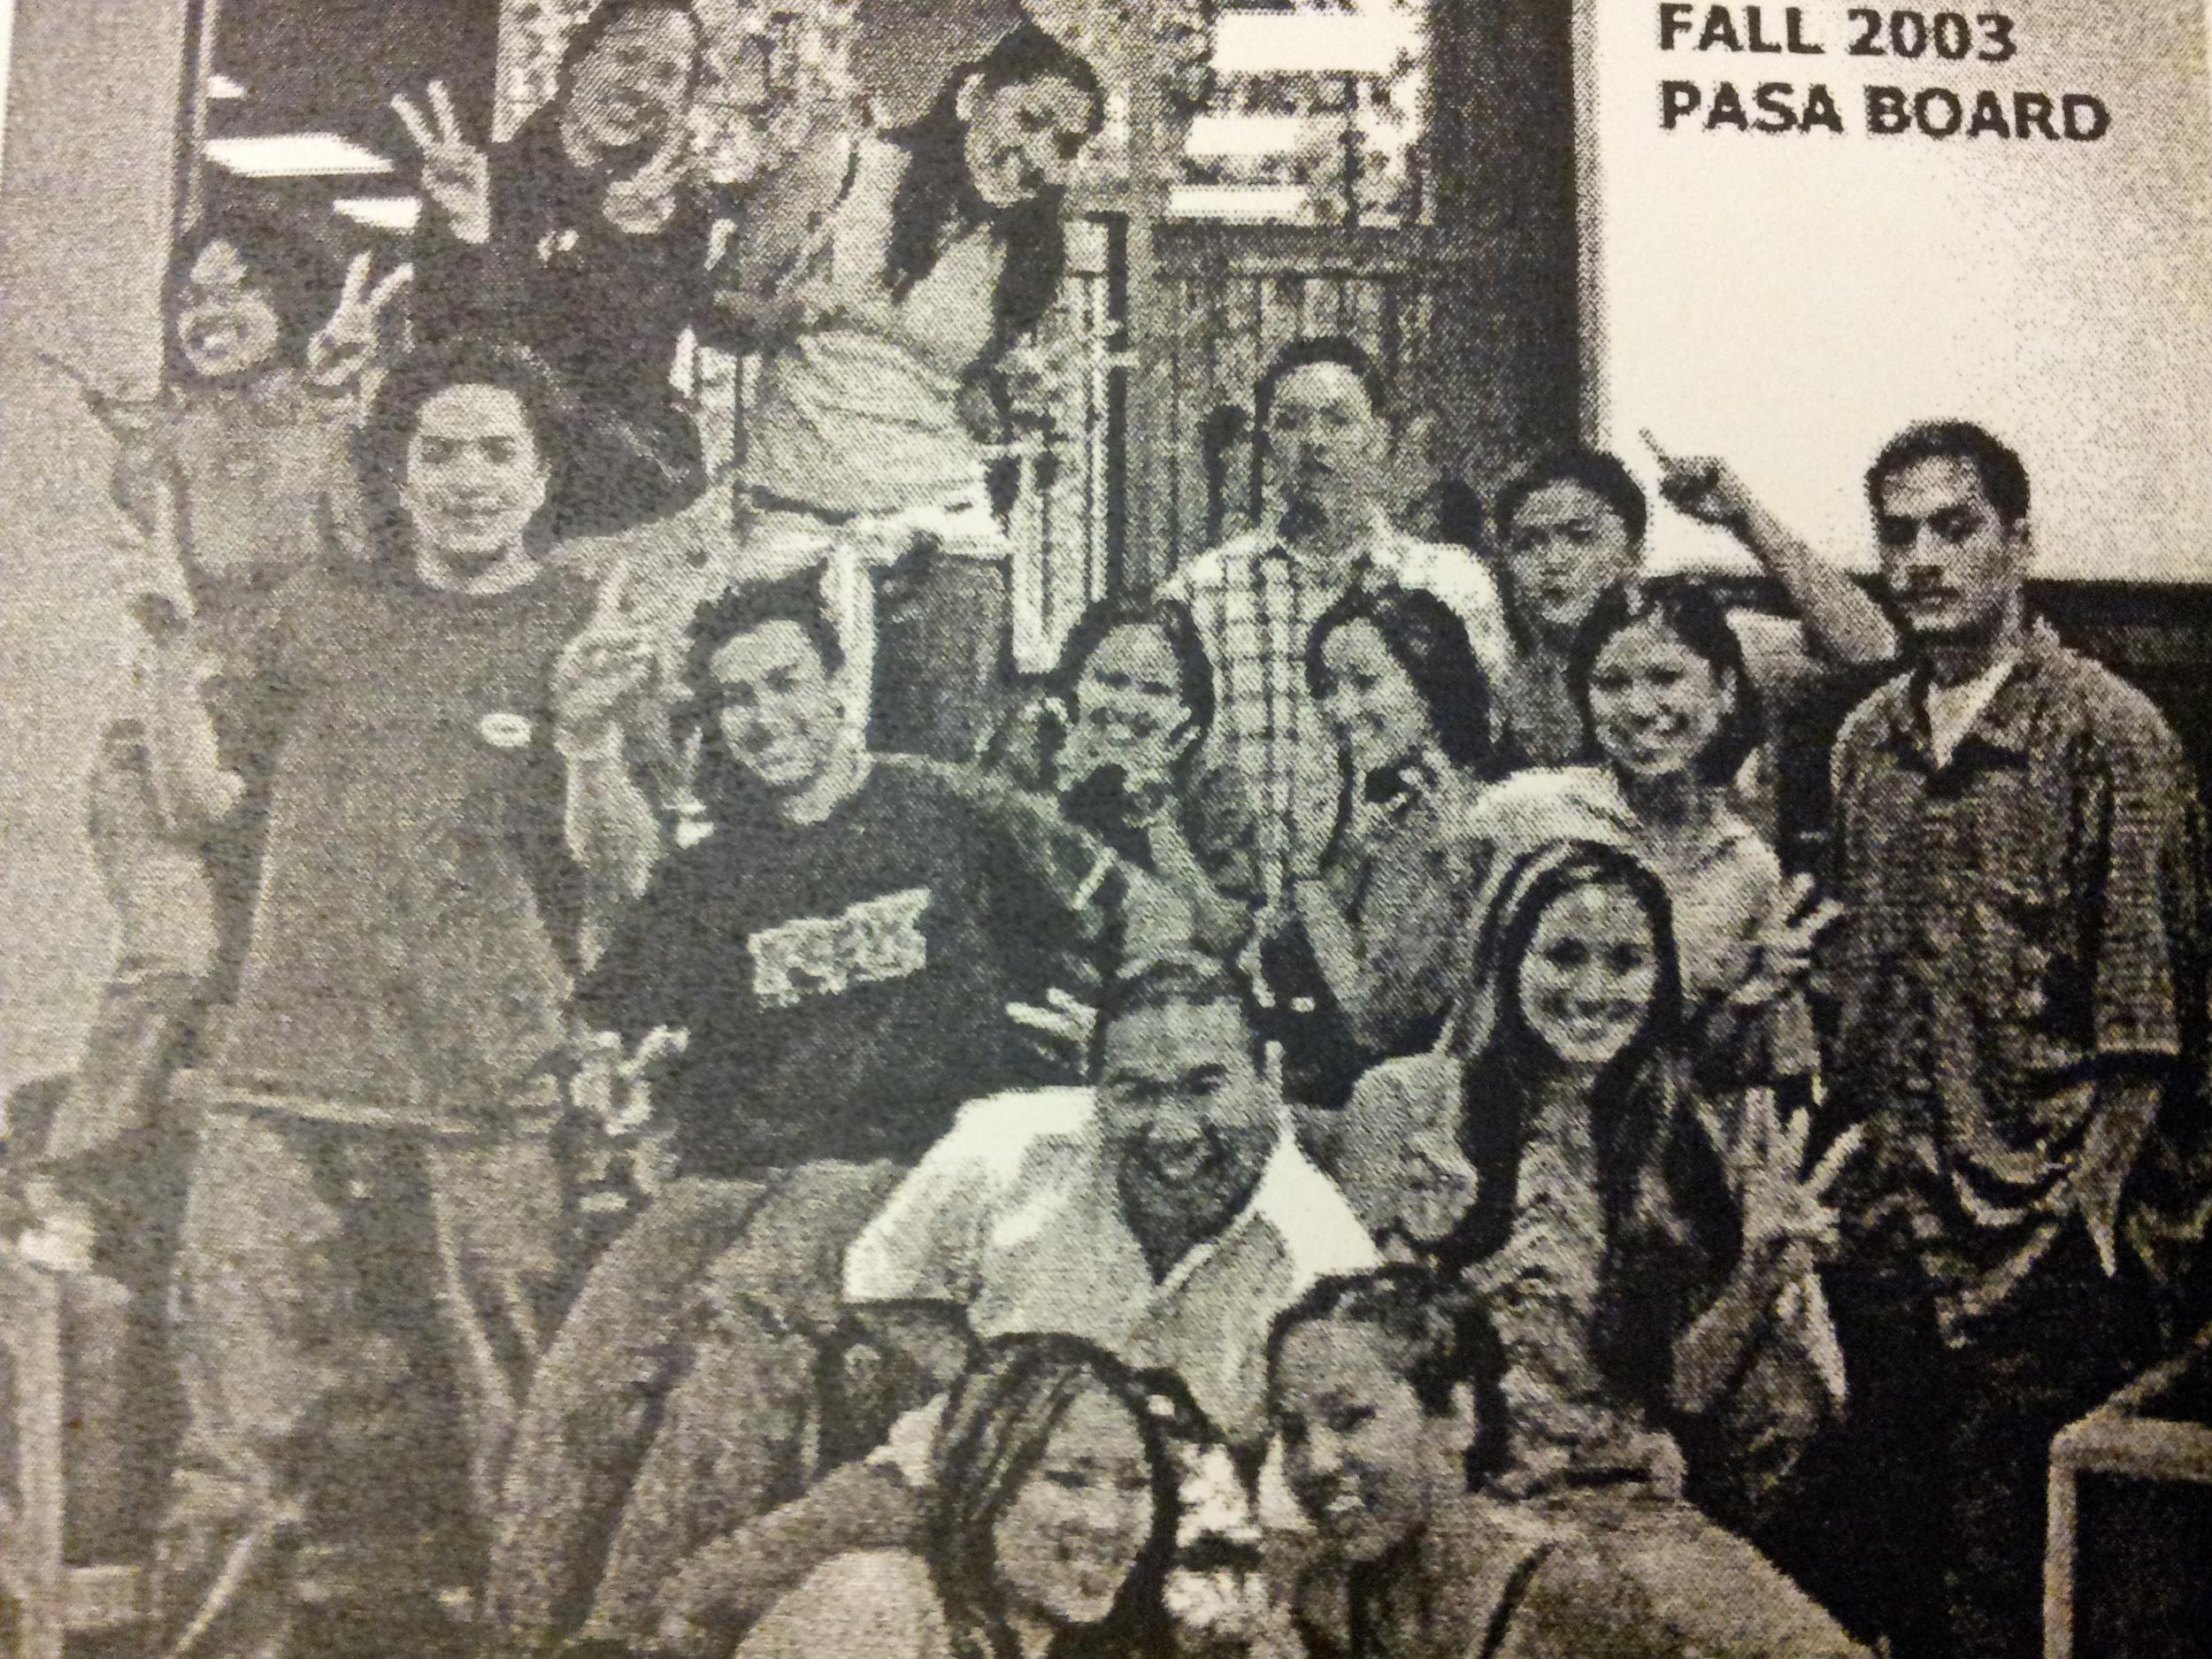 Fall 2003: President - Andrea De Guzman, Internal Vice President - Kathleen De La Pena, External Vice President - Anthony Abadilla, Secretary - Charlene Nulud, Treasurer - Marc Esperanza, FG Coordinator - VinceAyson,PCN Coordinator - Randi Lopez, PCN Dance Coordinator - Khristine De La Pena,Academic Chair - Lyn, Social Chair - Mariel, Sports Coordinator - Laurianne Castillo, Kronicle Editor - Tish Pham, Historian - Dana